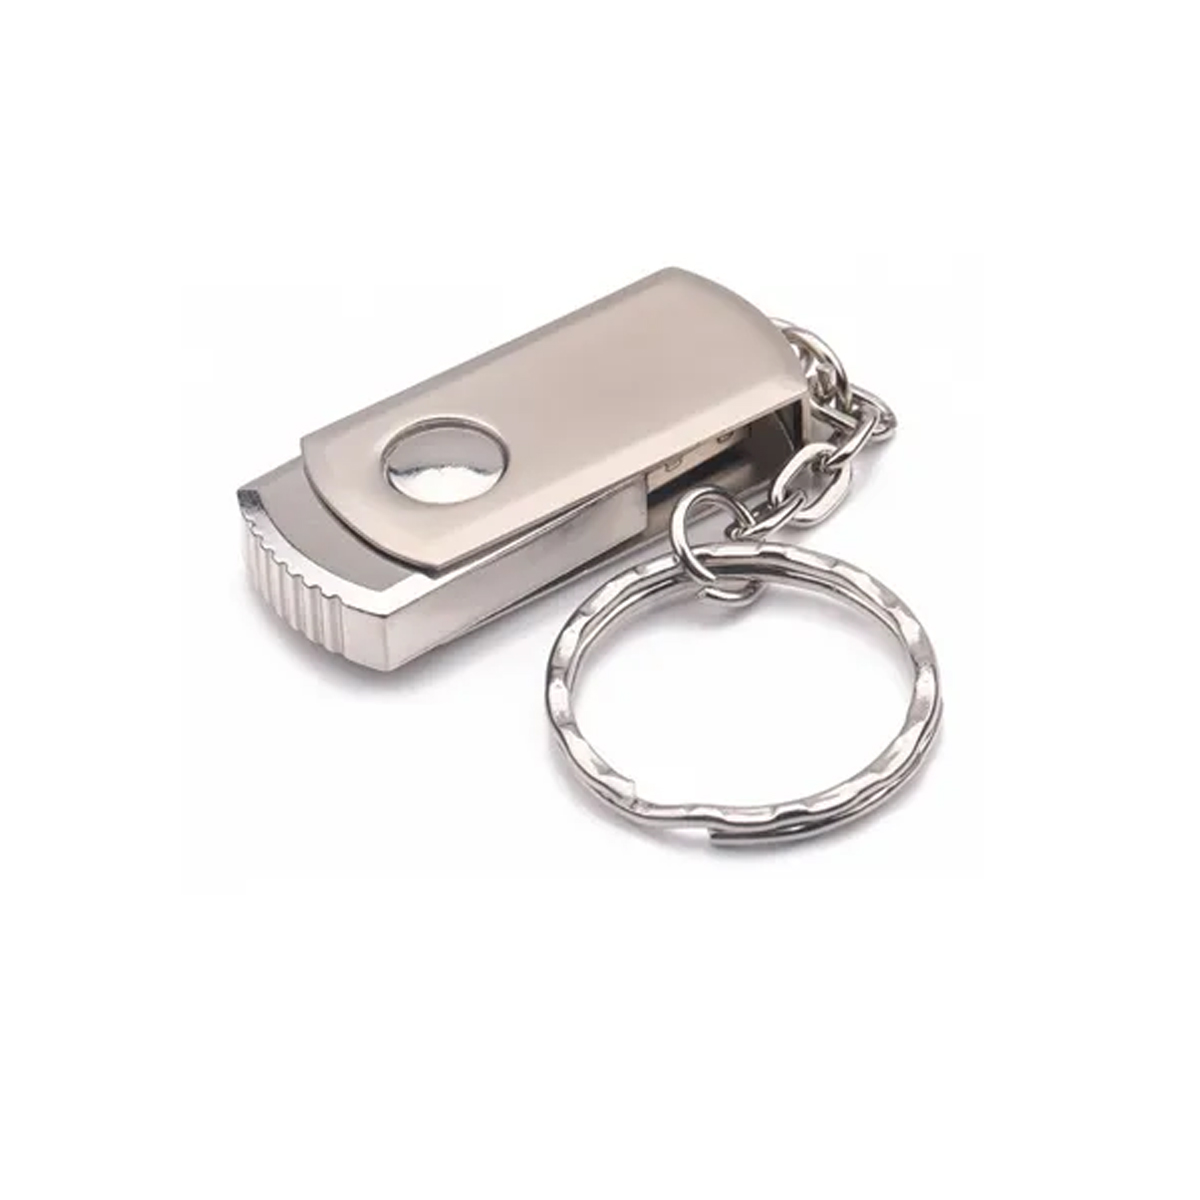 Pendrives Mini chaveiro Metal MF195 de  64 GB